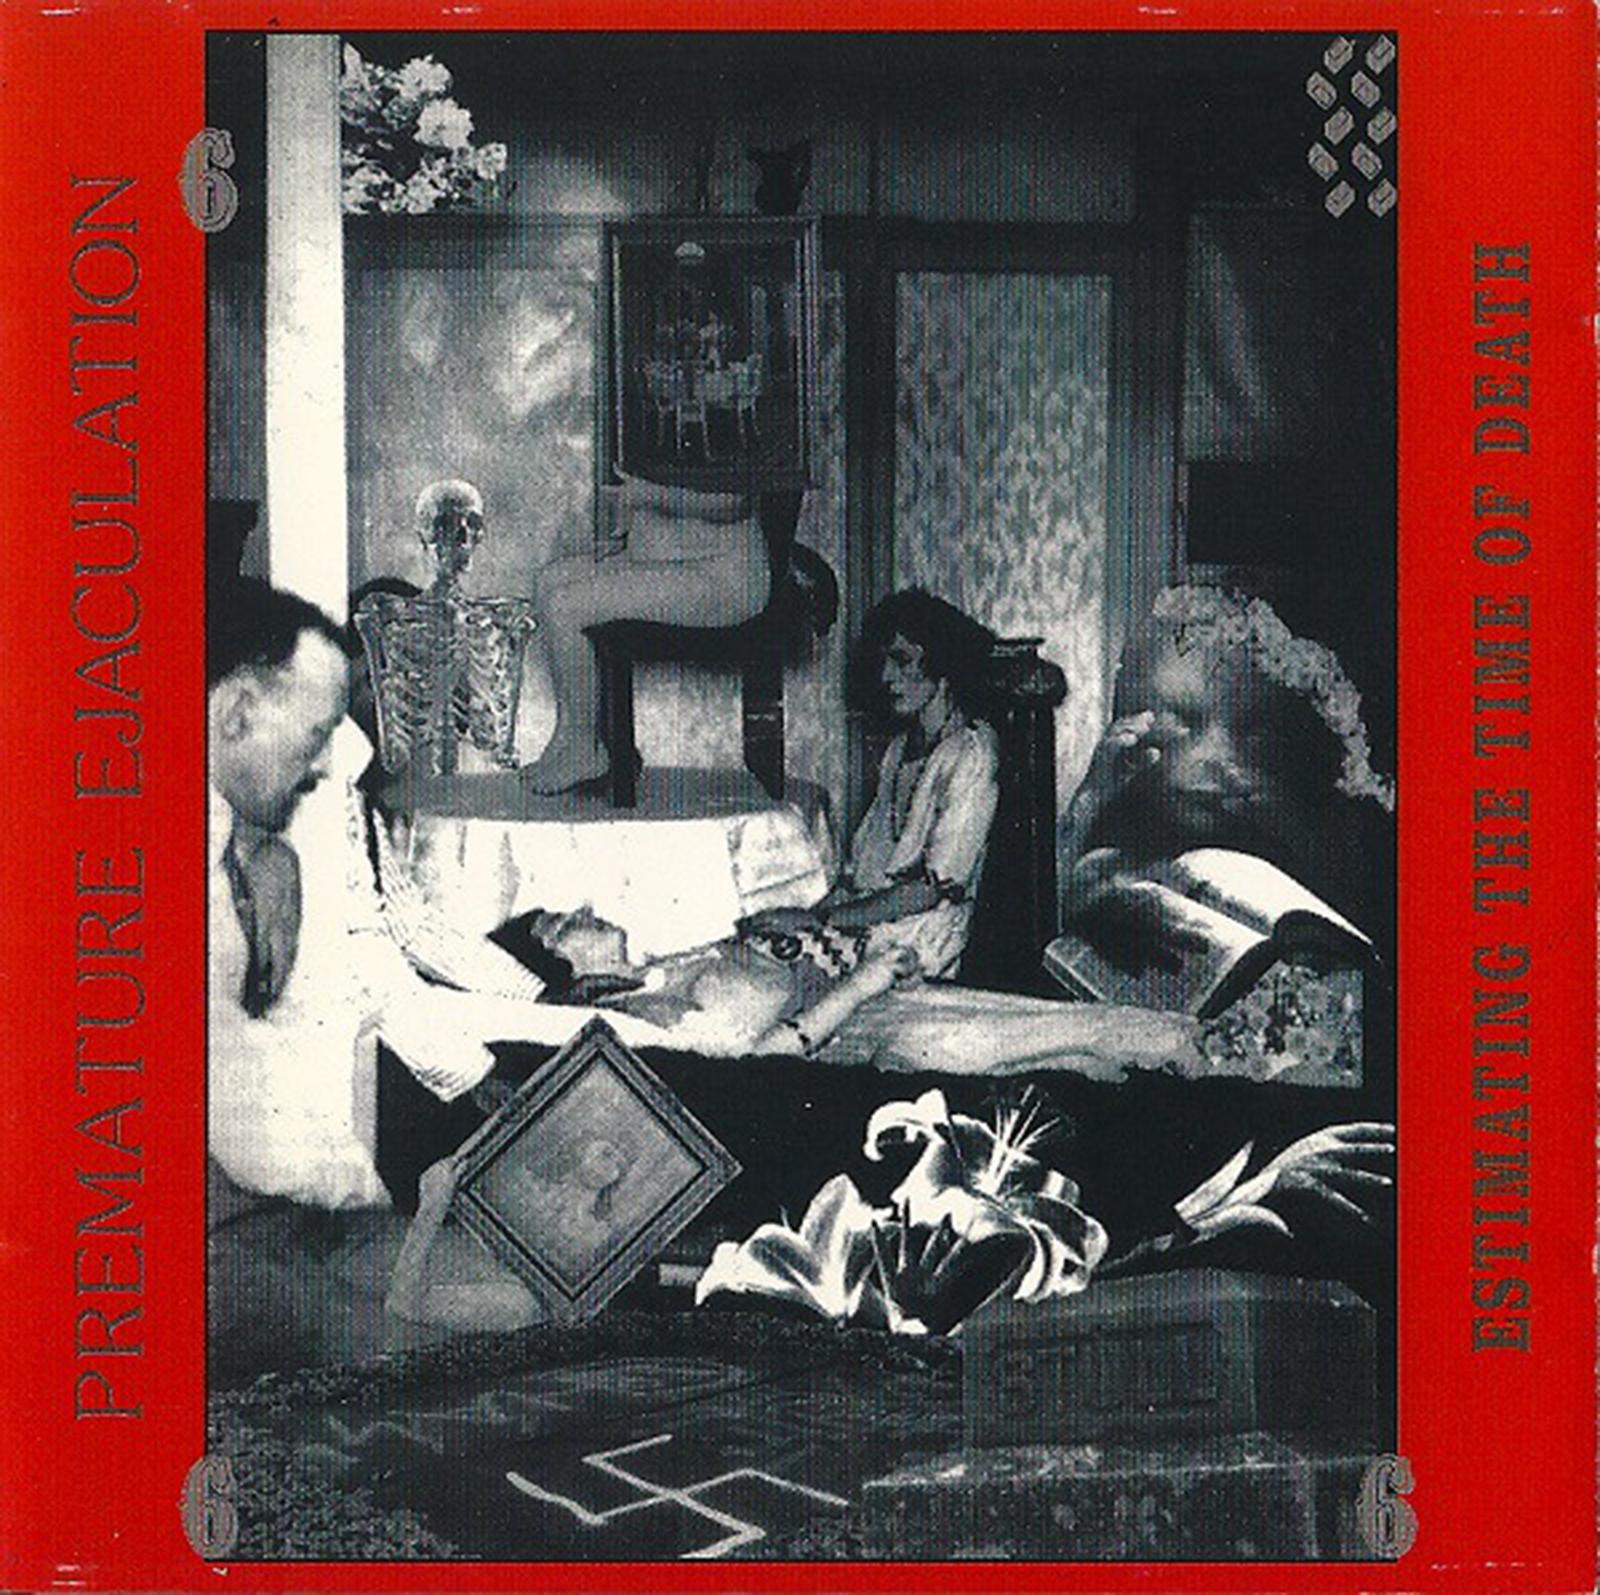 Premature Ejaculation – Estimating The Time Of Death (CD ALBUM, 1994, FLAC)